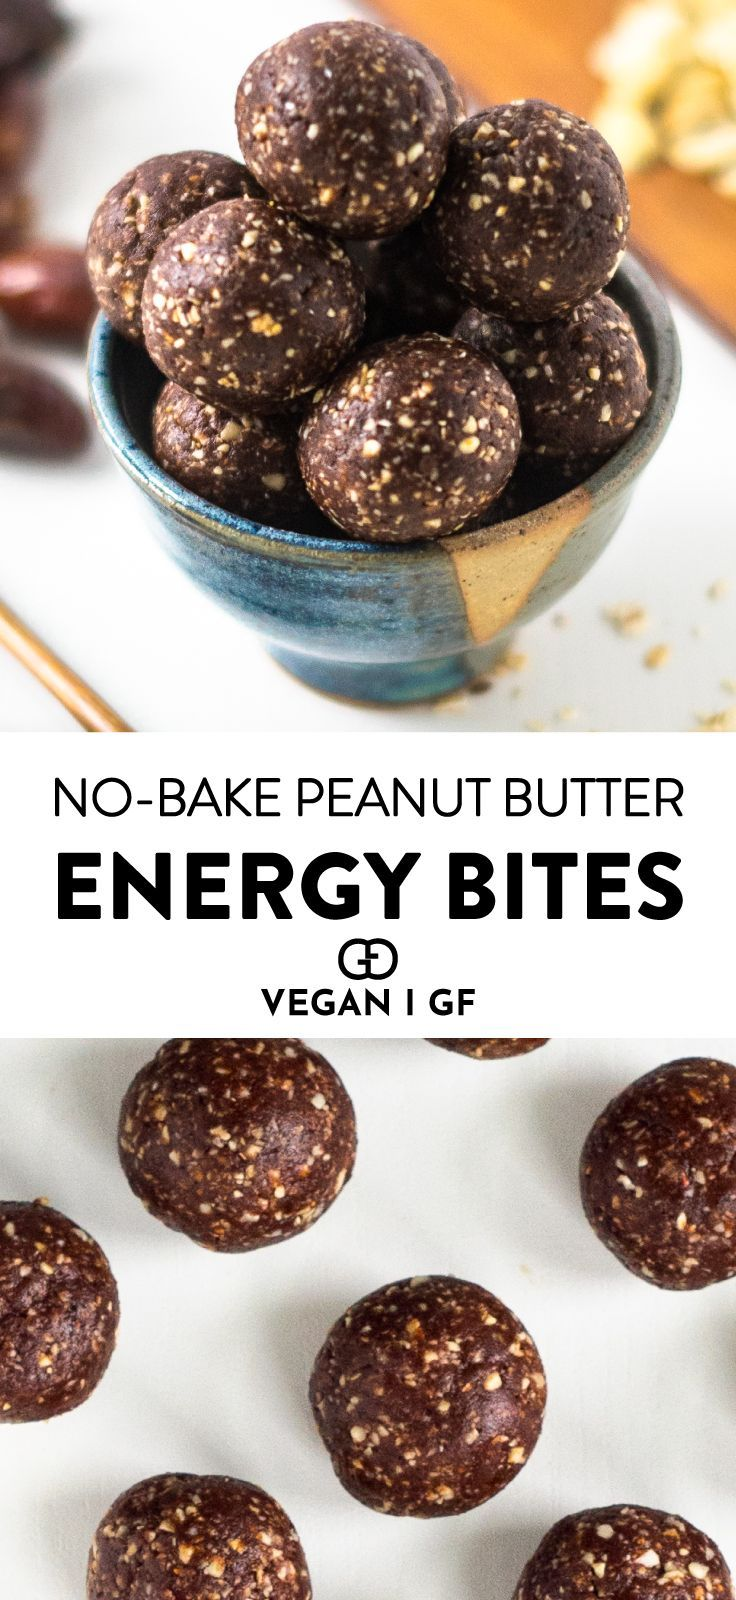 No Bake Peanut Butter Balls 5 Ingredient Recipe Peanut Butter Energy Bites Healthy Vegan Snacks Peanut Butter Balls Recipe